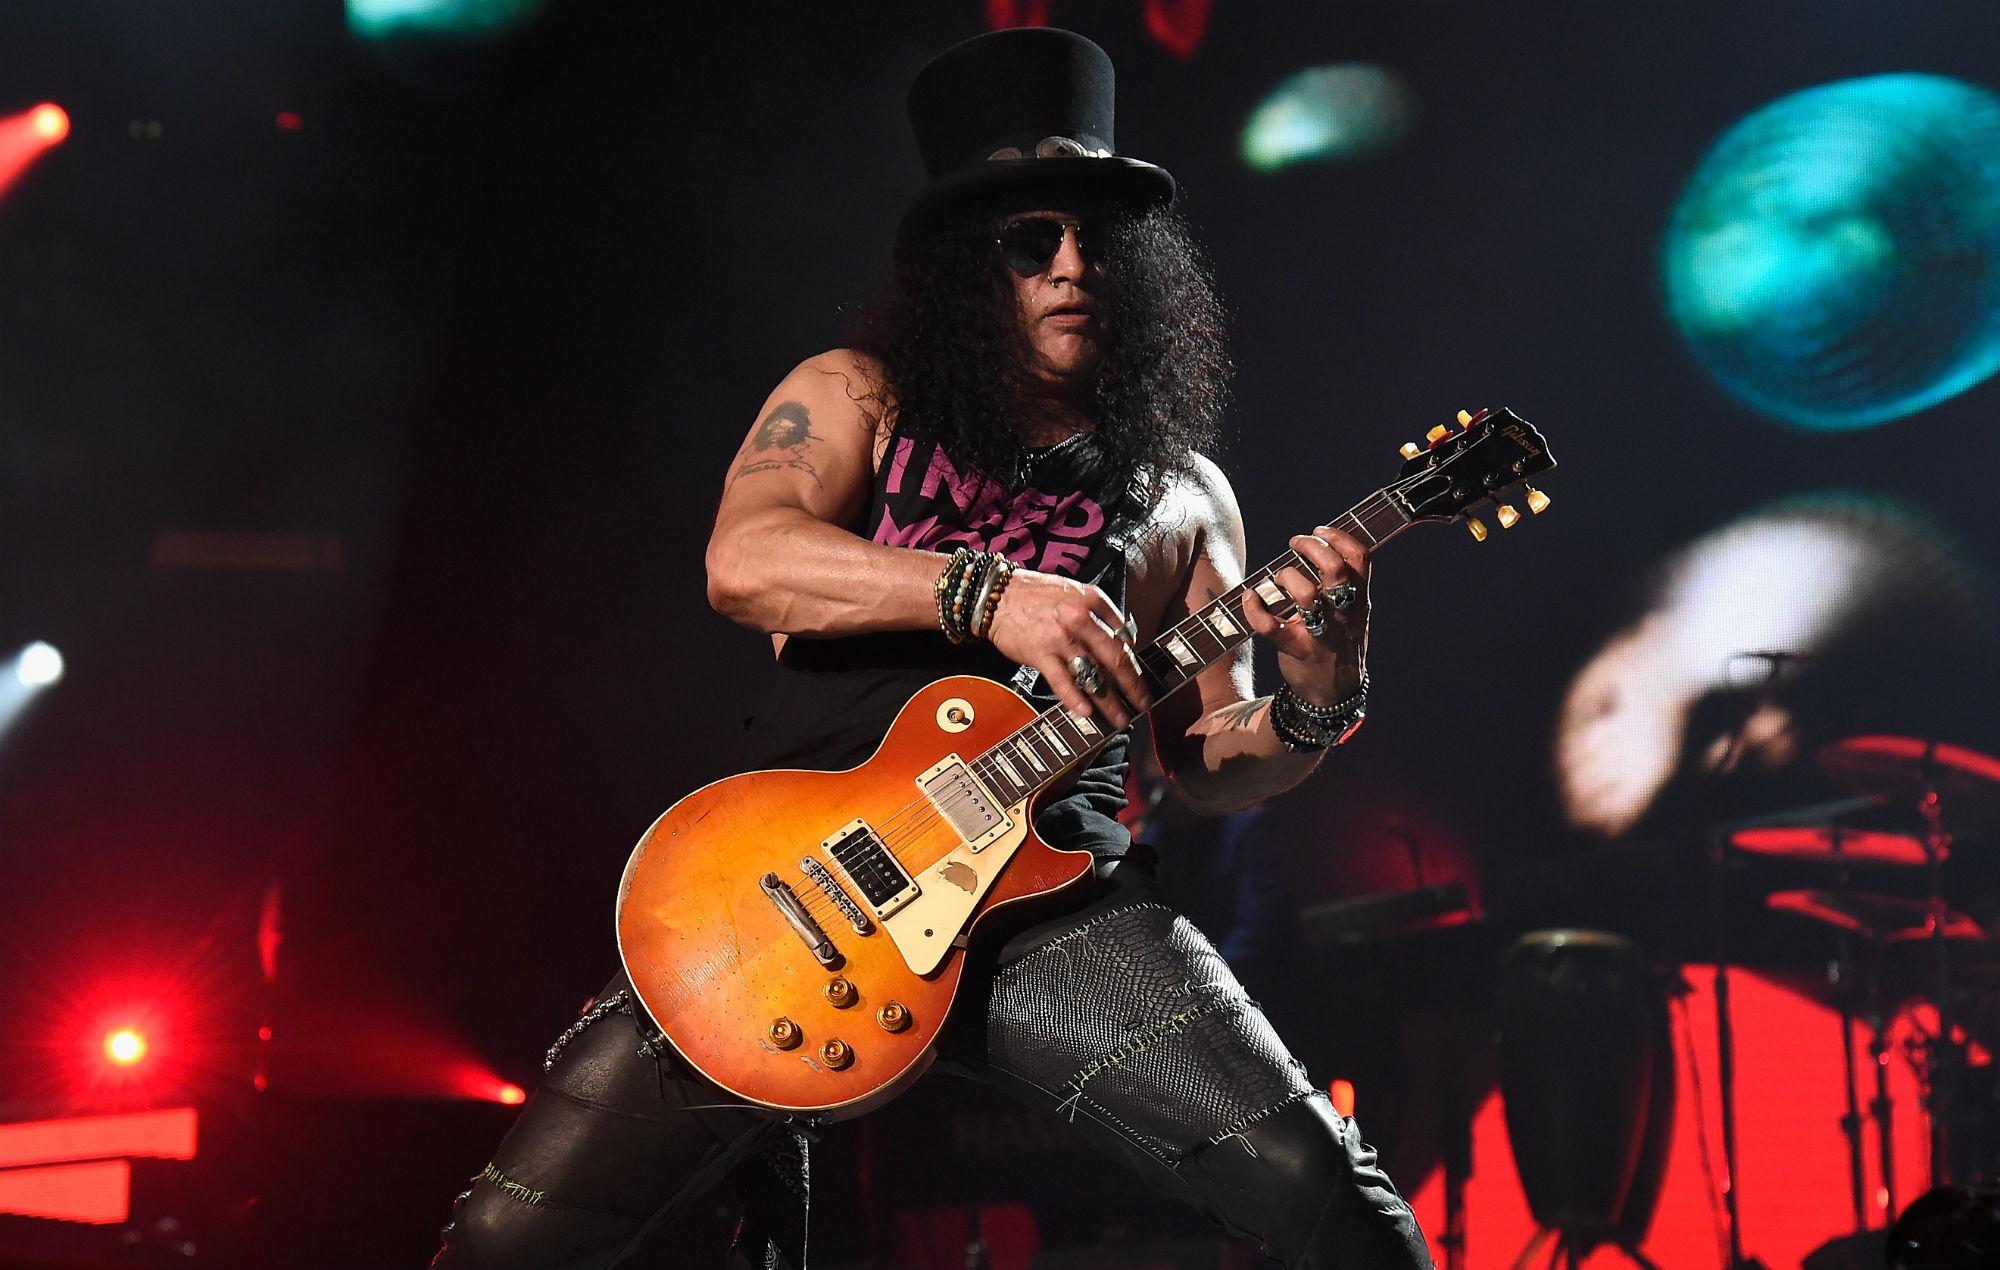 Slash says he anticipates new Guns N' Roses music in 2021